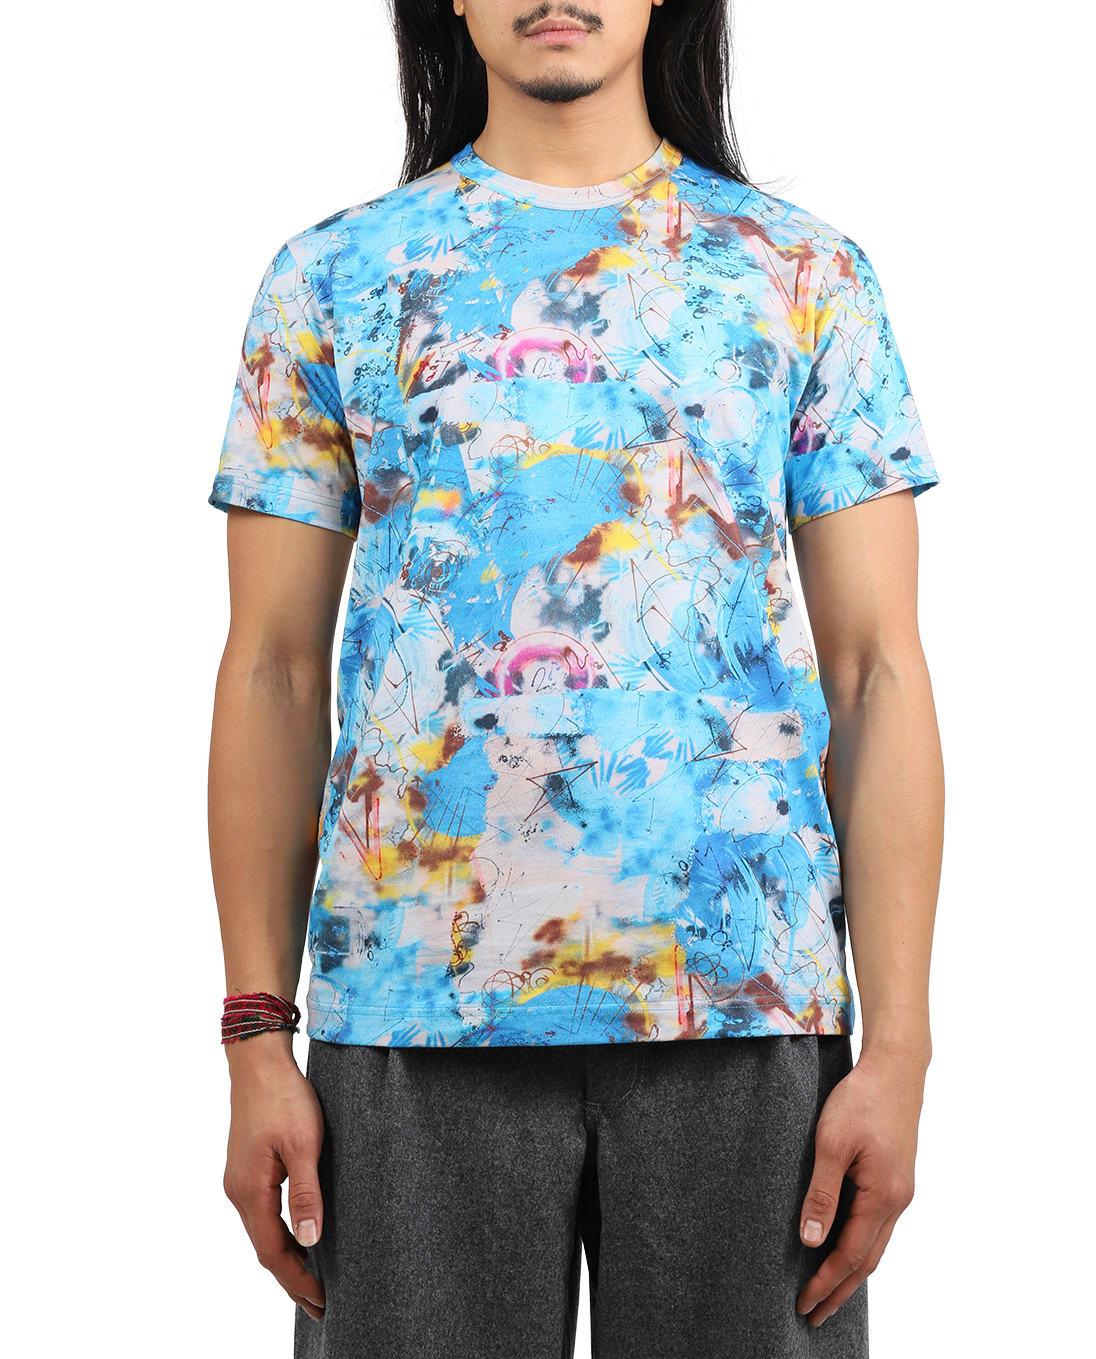 Comme Des Garçons Shirt COMME DES GARCONS SHIRT LIGHT BLUE FUTURA T-SHIRT